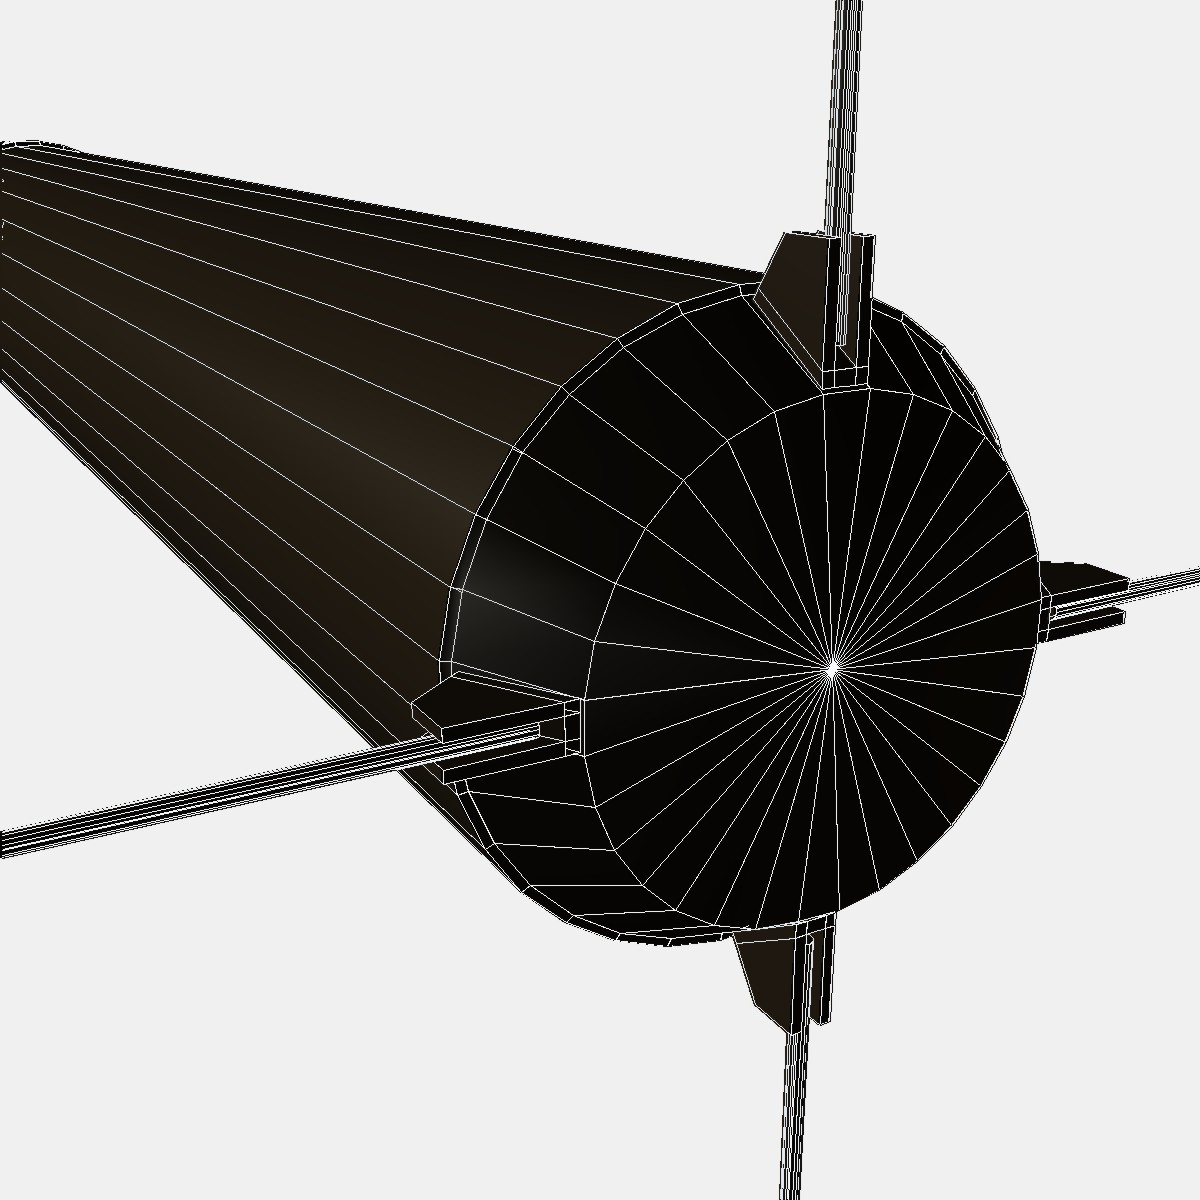 mk-234 nulka decoy 3d model 3ds dxf fbx blend cob dae x obj 217817